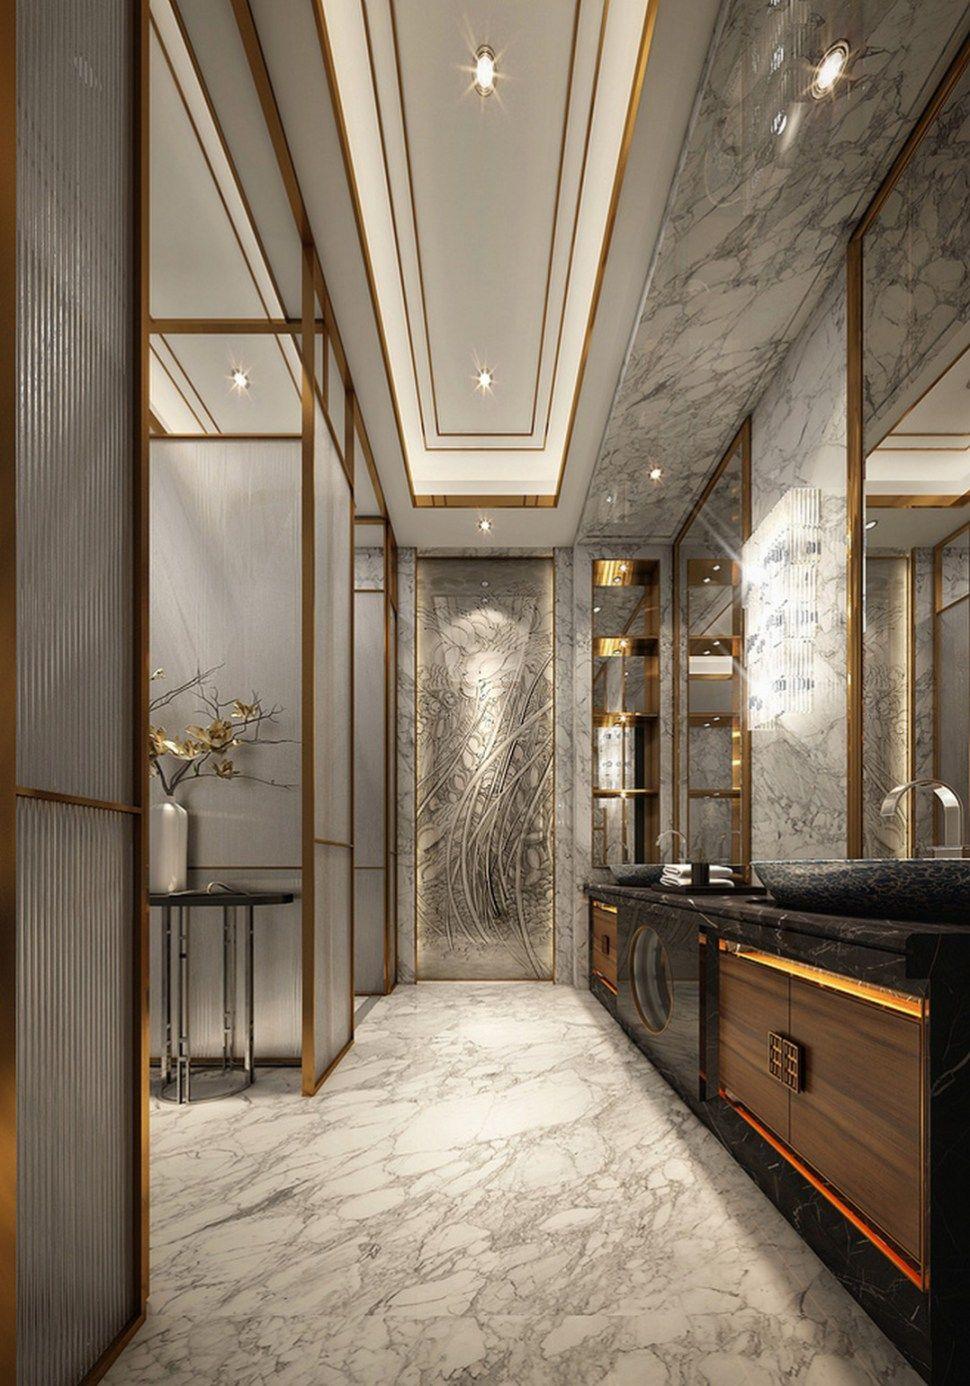 Modern And Luxury Bathroom Design Ideas 13 Contemporary Master Bathroom Bathroom Design Luxury Modern Master Bathroom